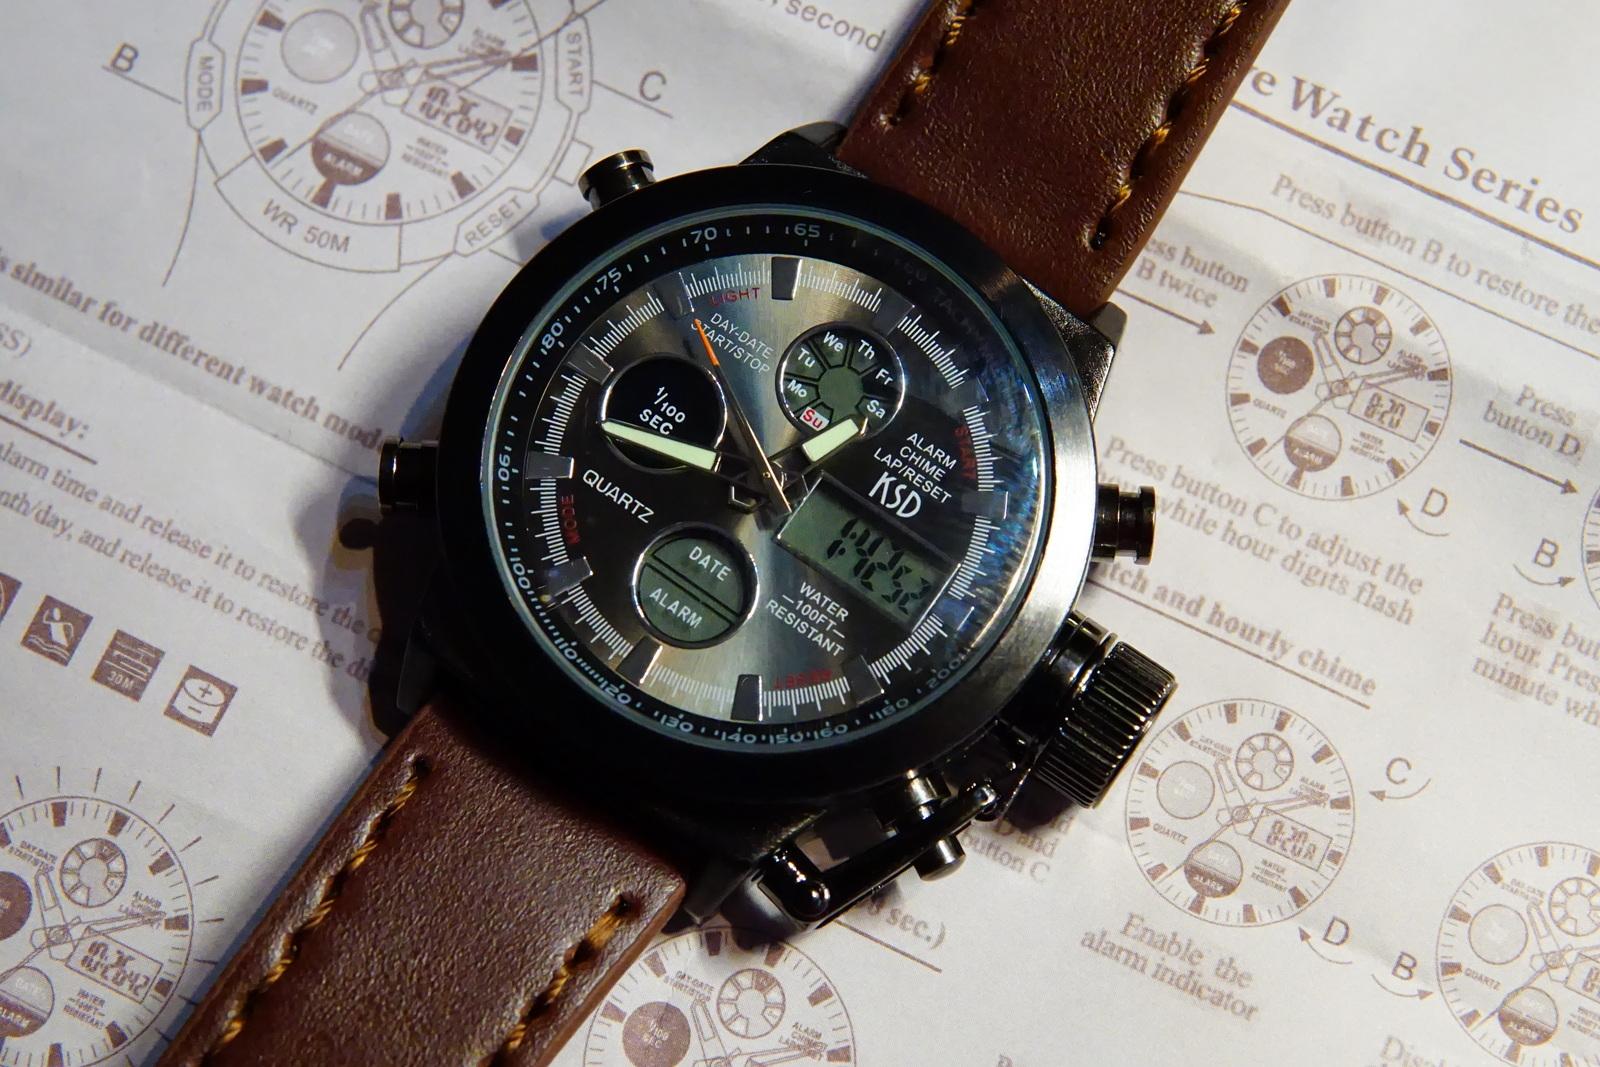 mambo digital watch instructions